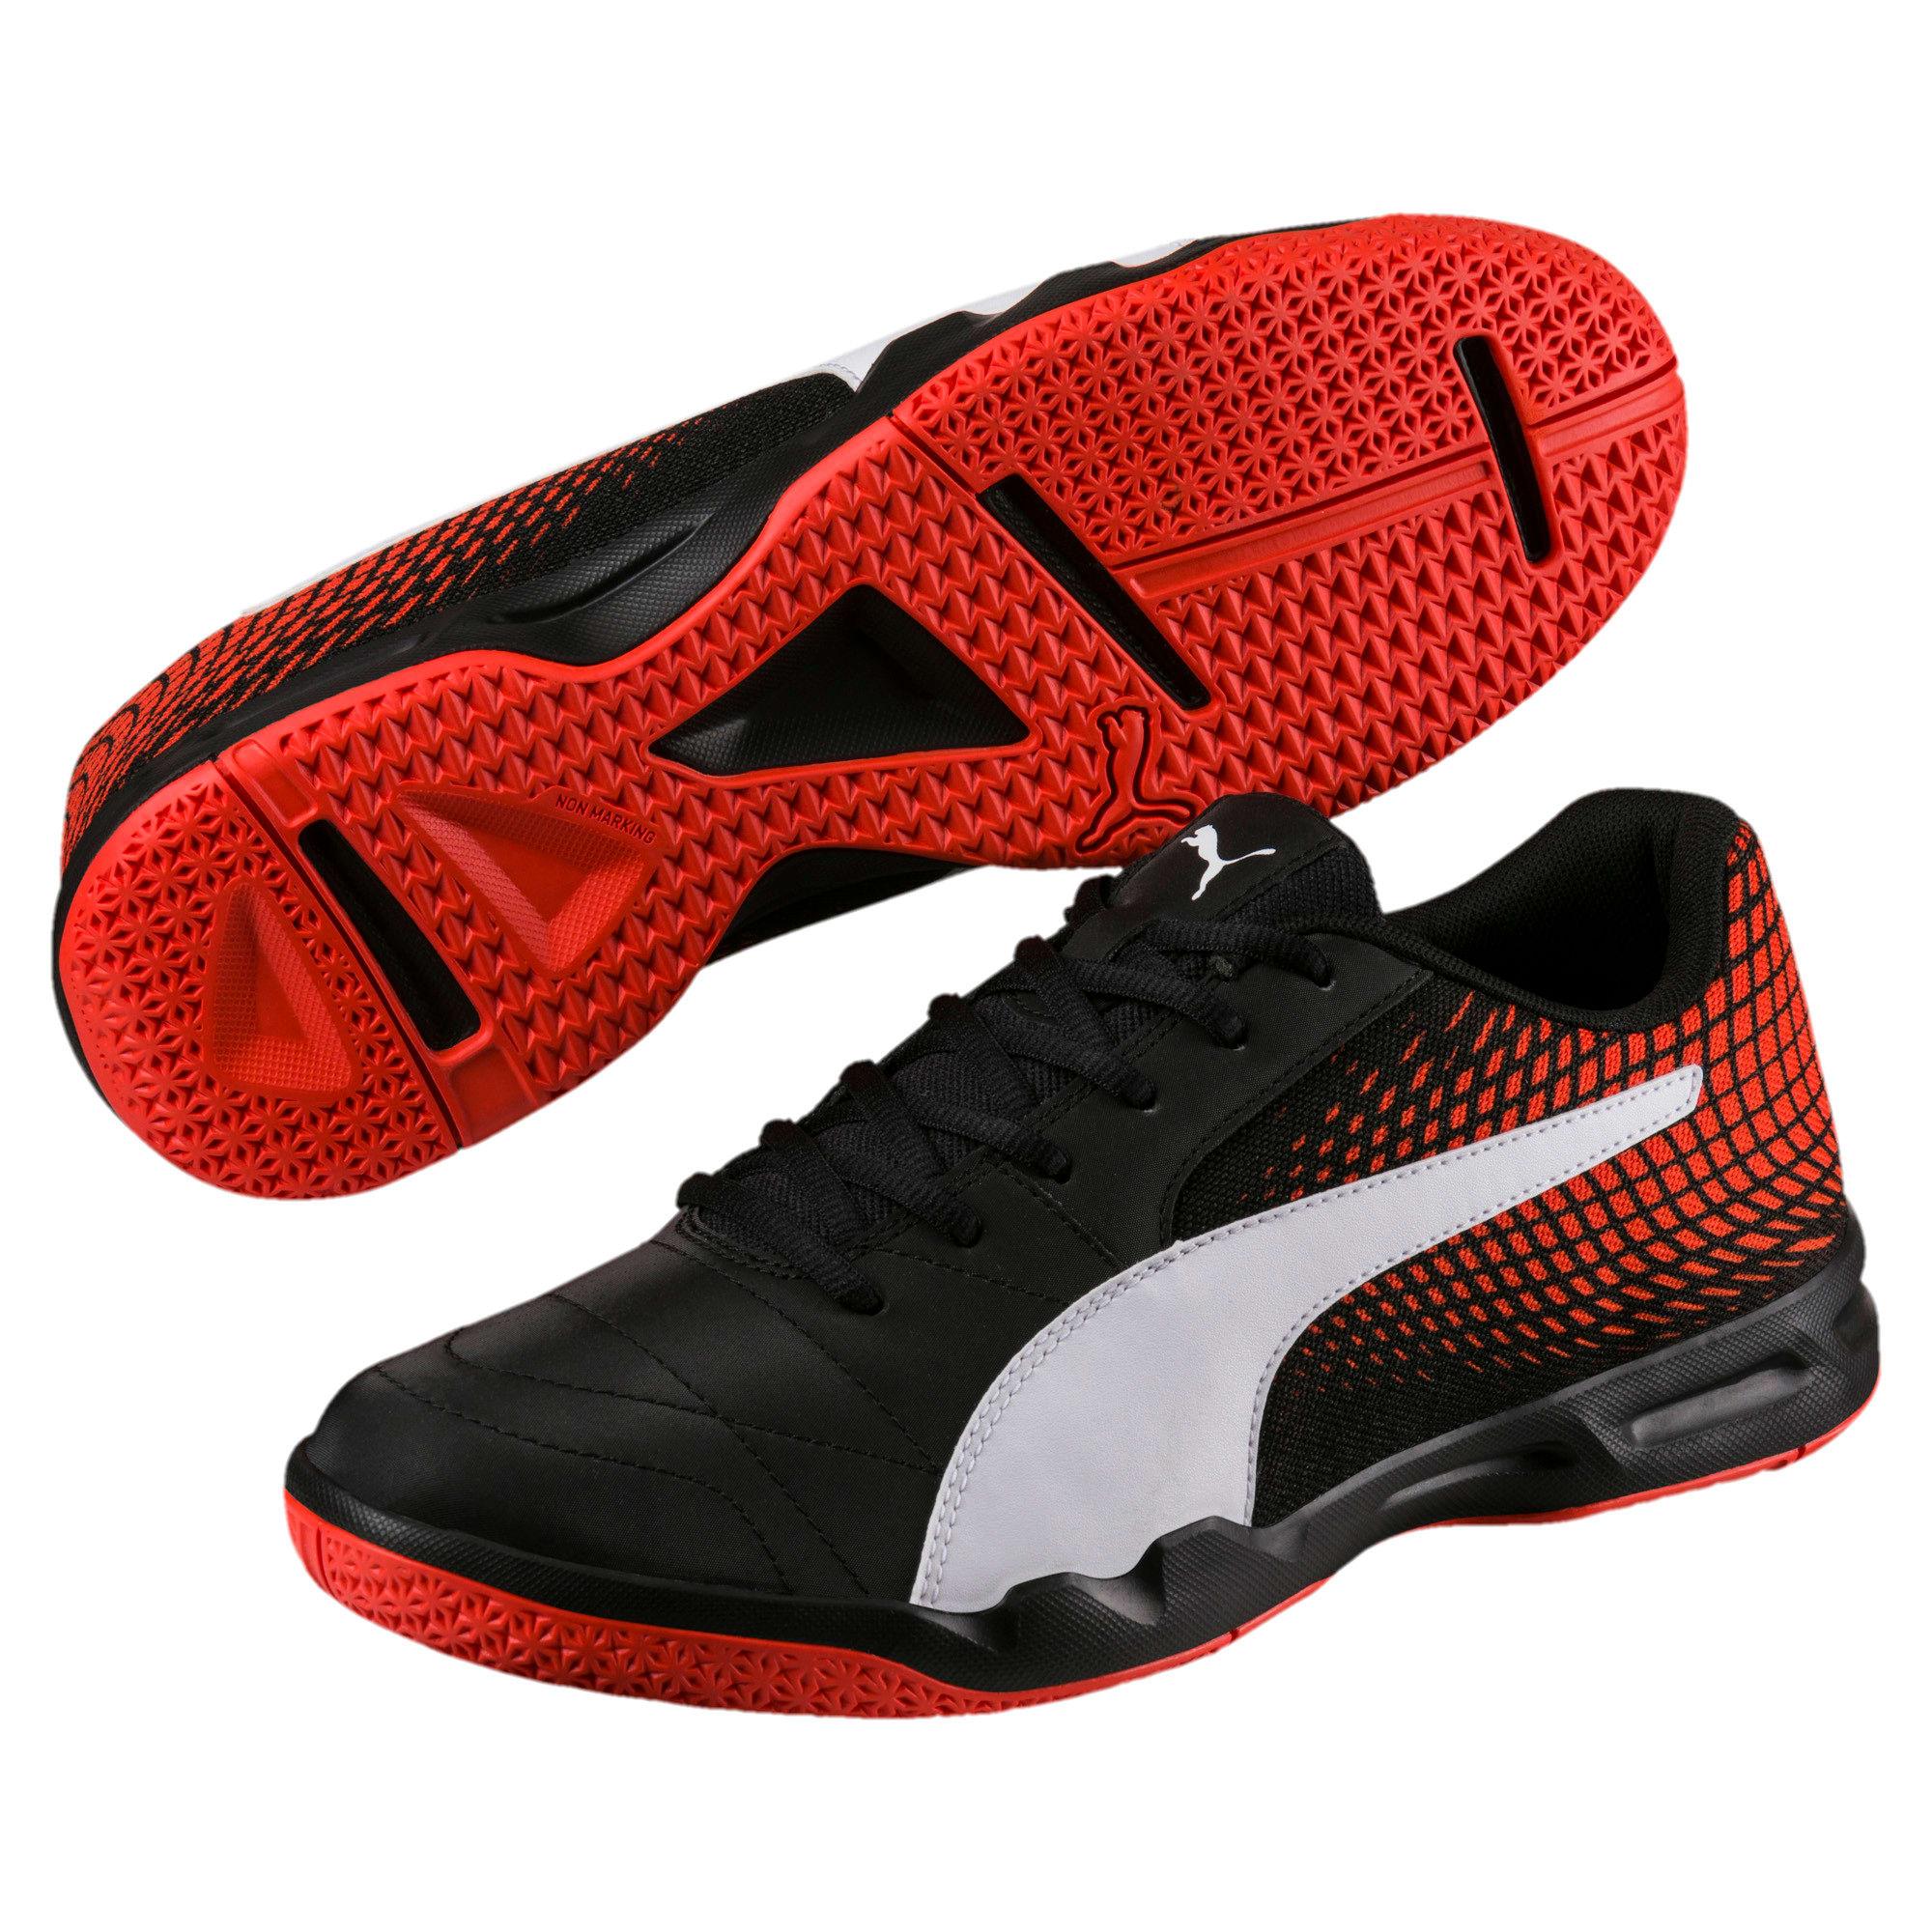 Thumbnail 2 of Veloz Indoor NG Training Shoes, Black-White-Cherry, medium-IND